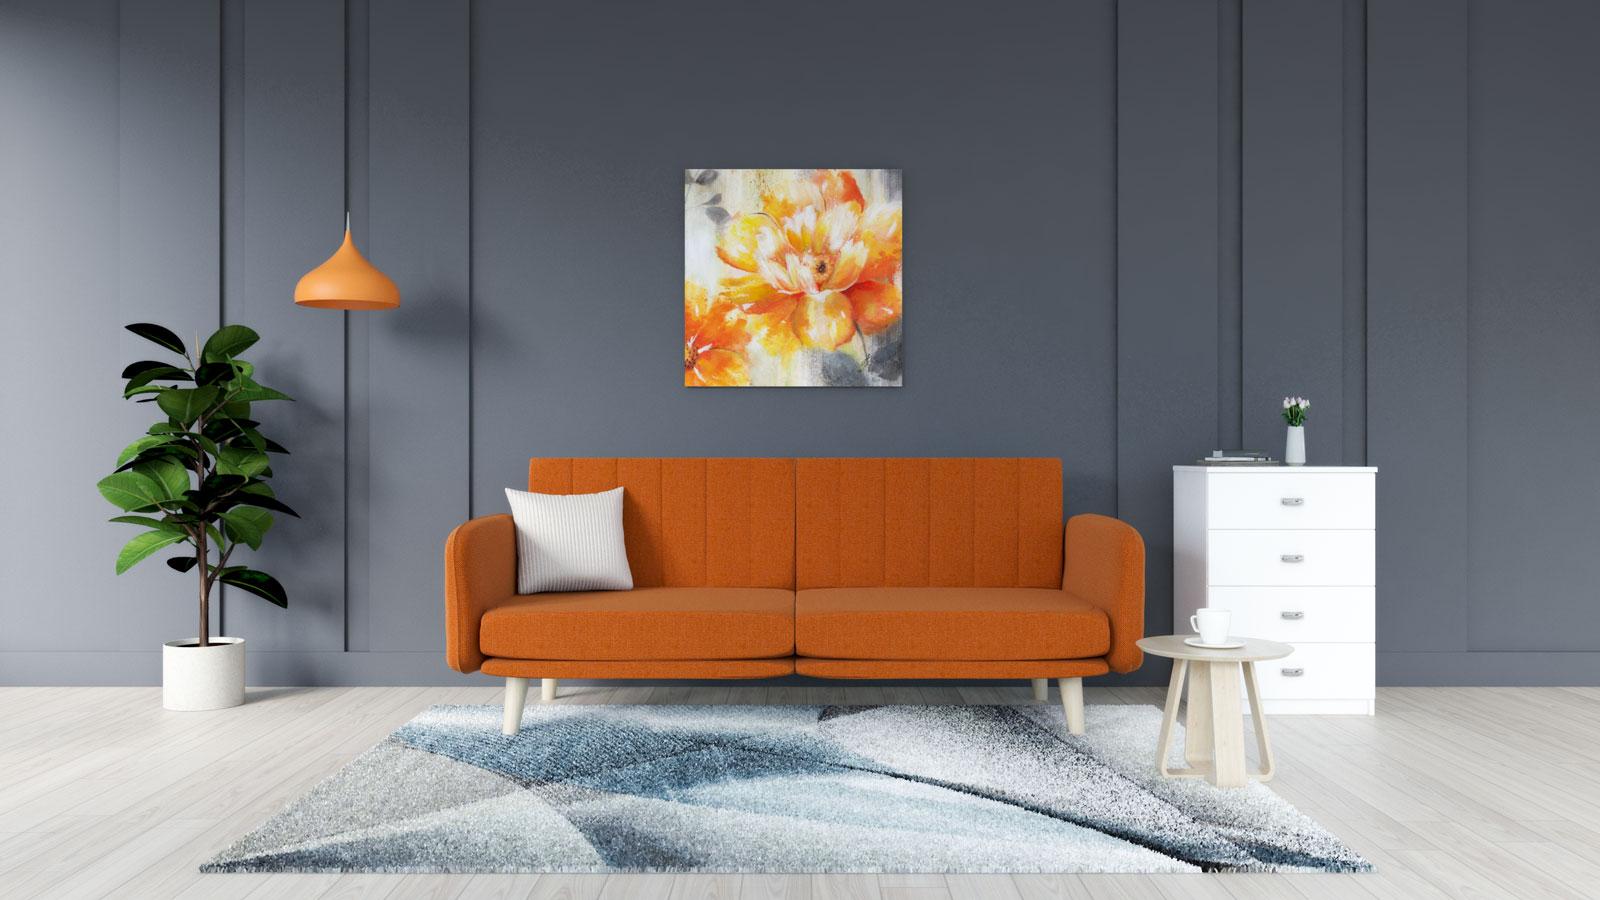 Gray and blue rug with orange sofa